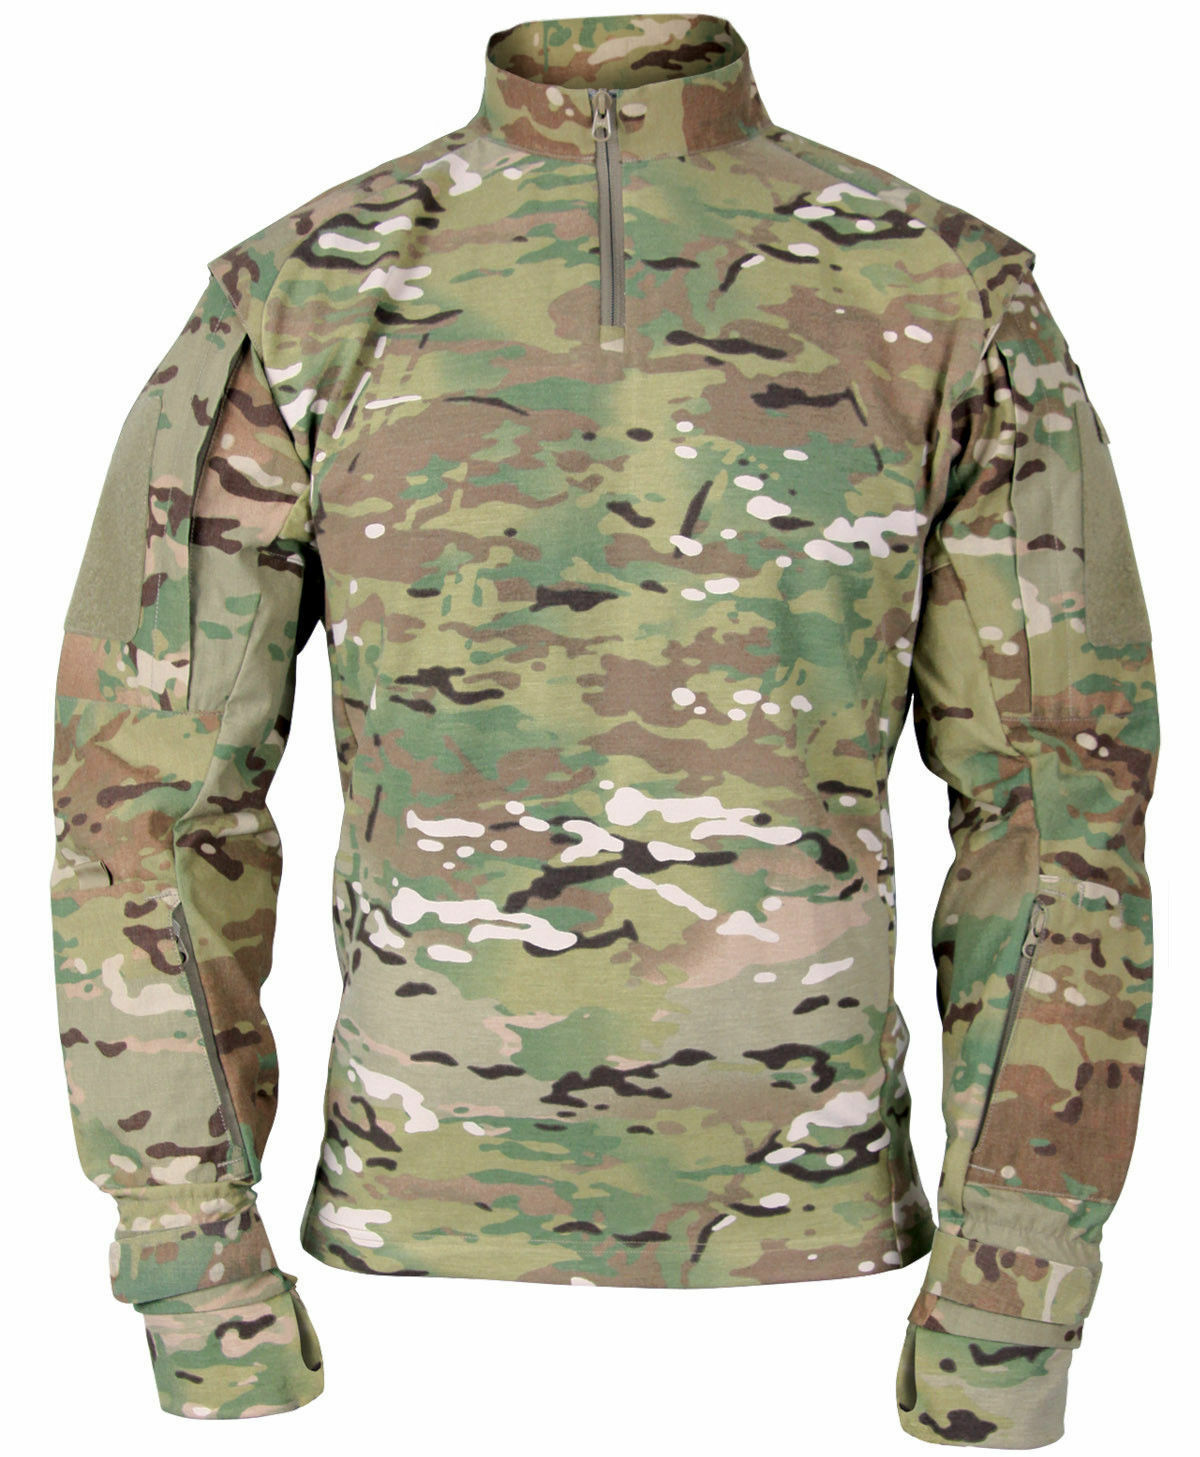 Multicam Camo Tac. u Camisa De Combate por PROPPER F5417 Envío Gratis